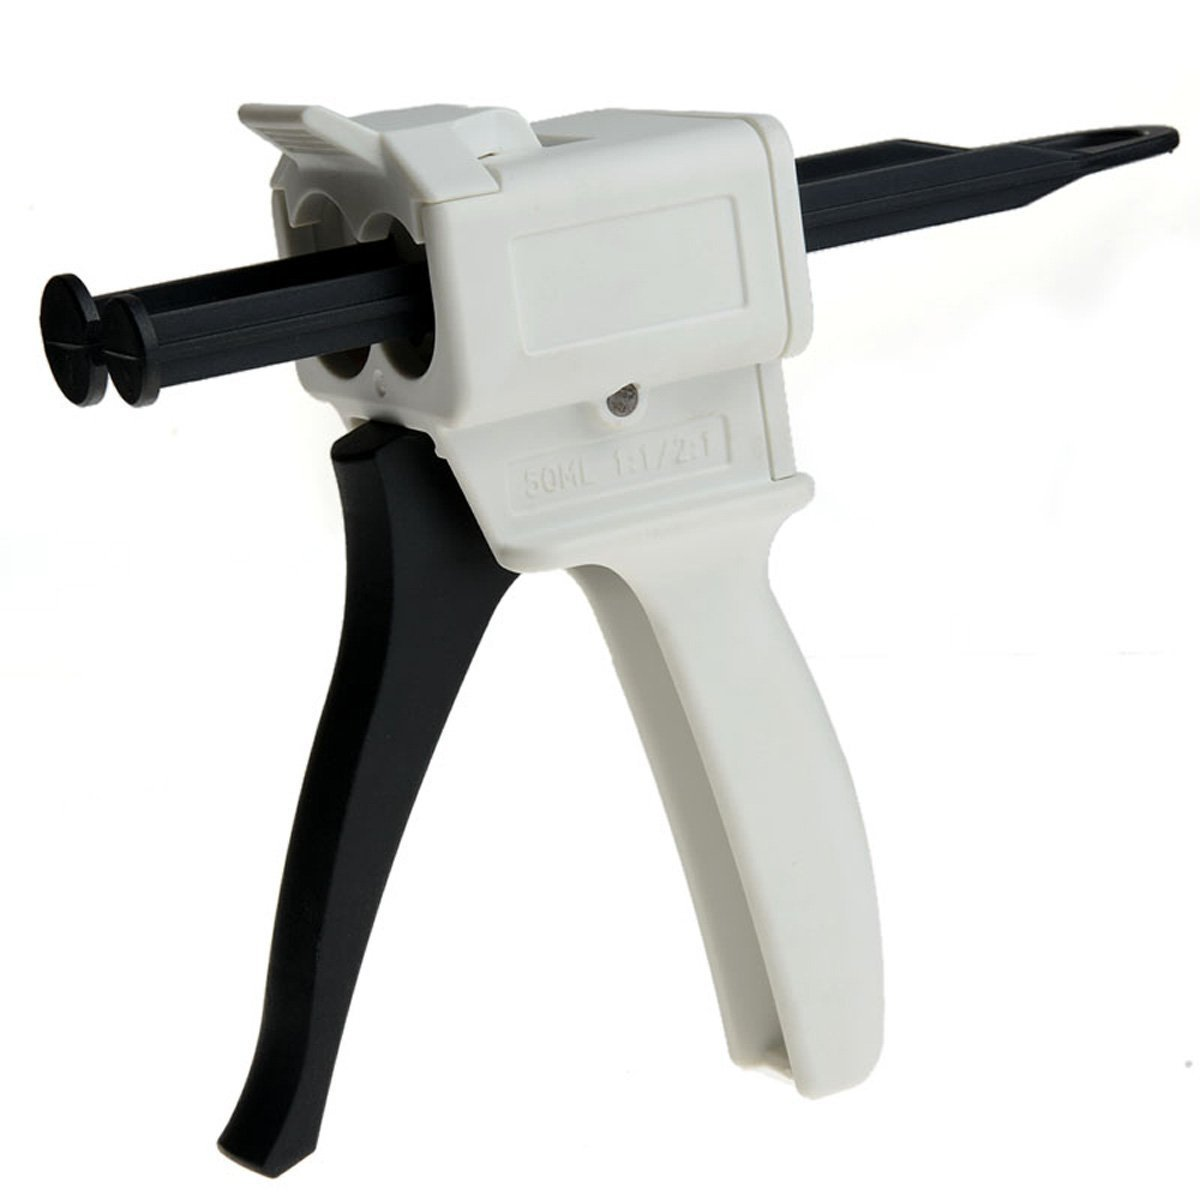 AZDENT Dental Impression Mixing Dispensing 50ml Dispenser Gun 1:1(2:1)